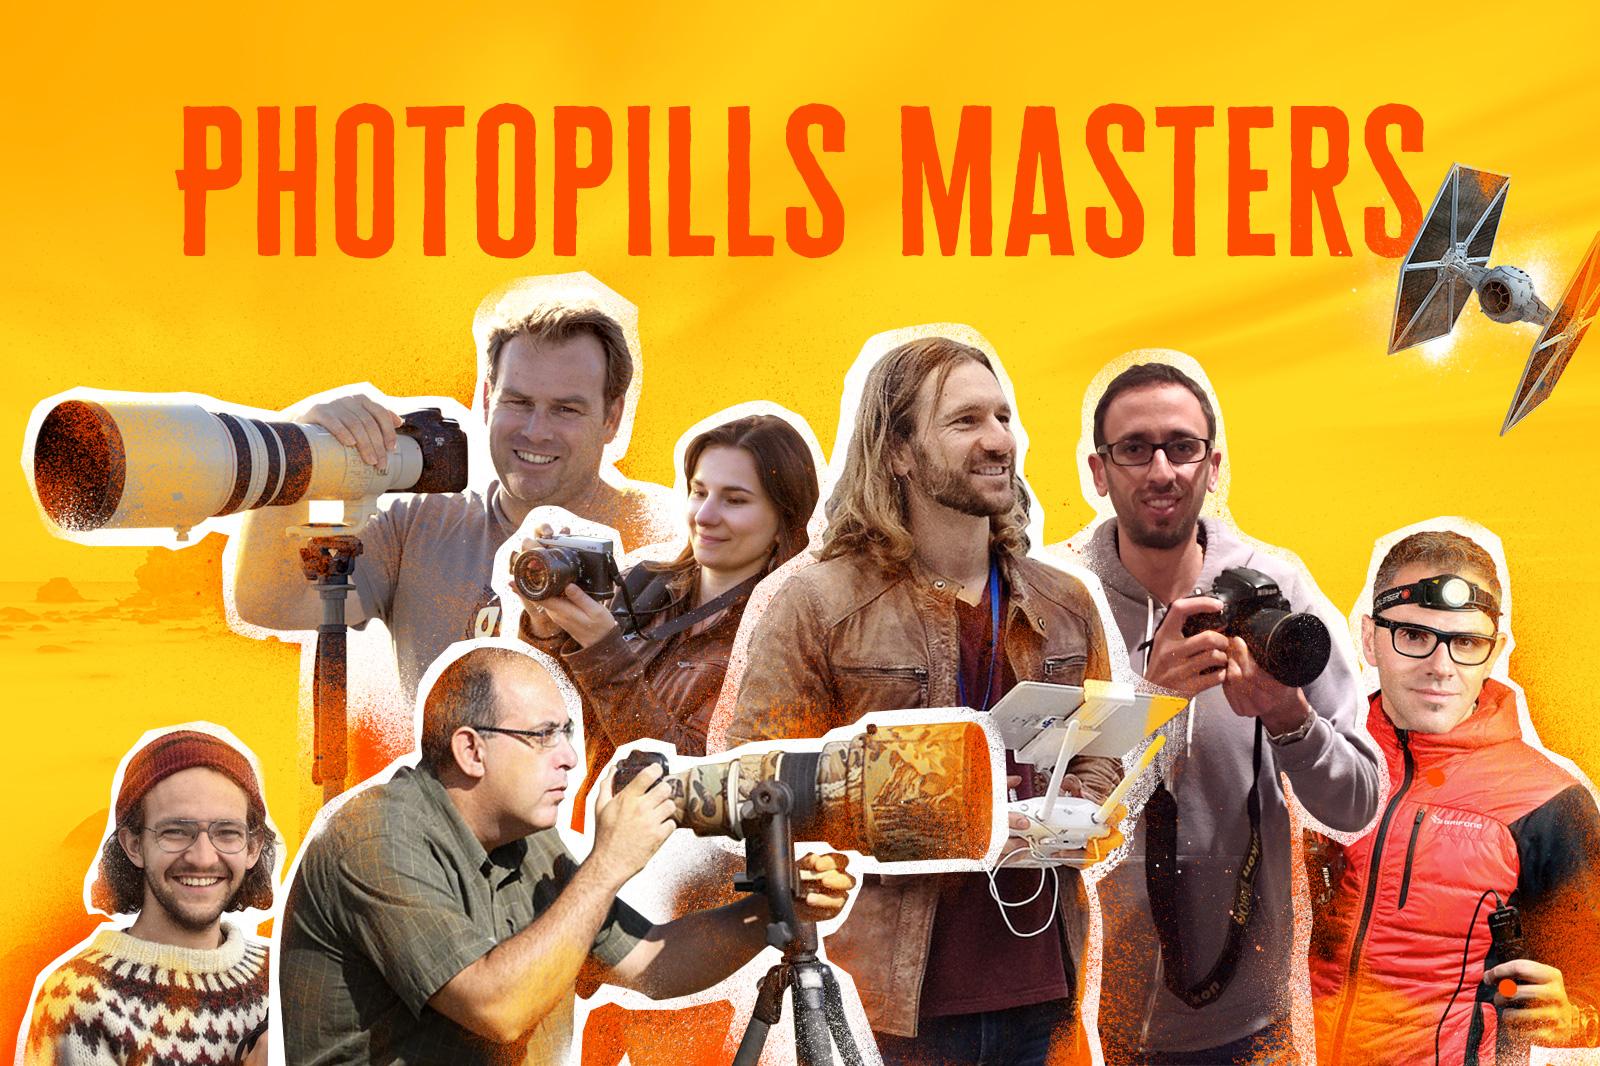 photopills-masters